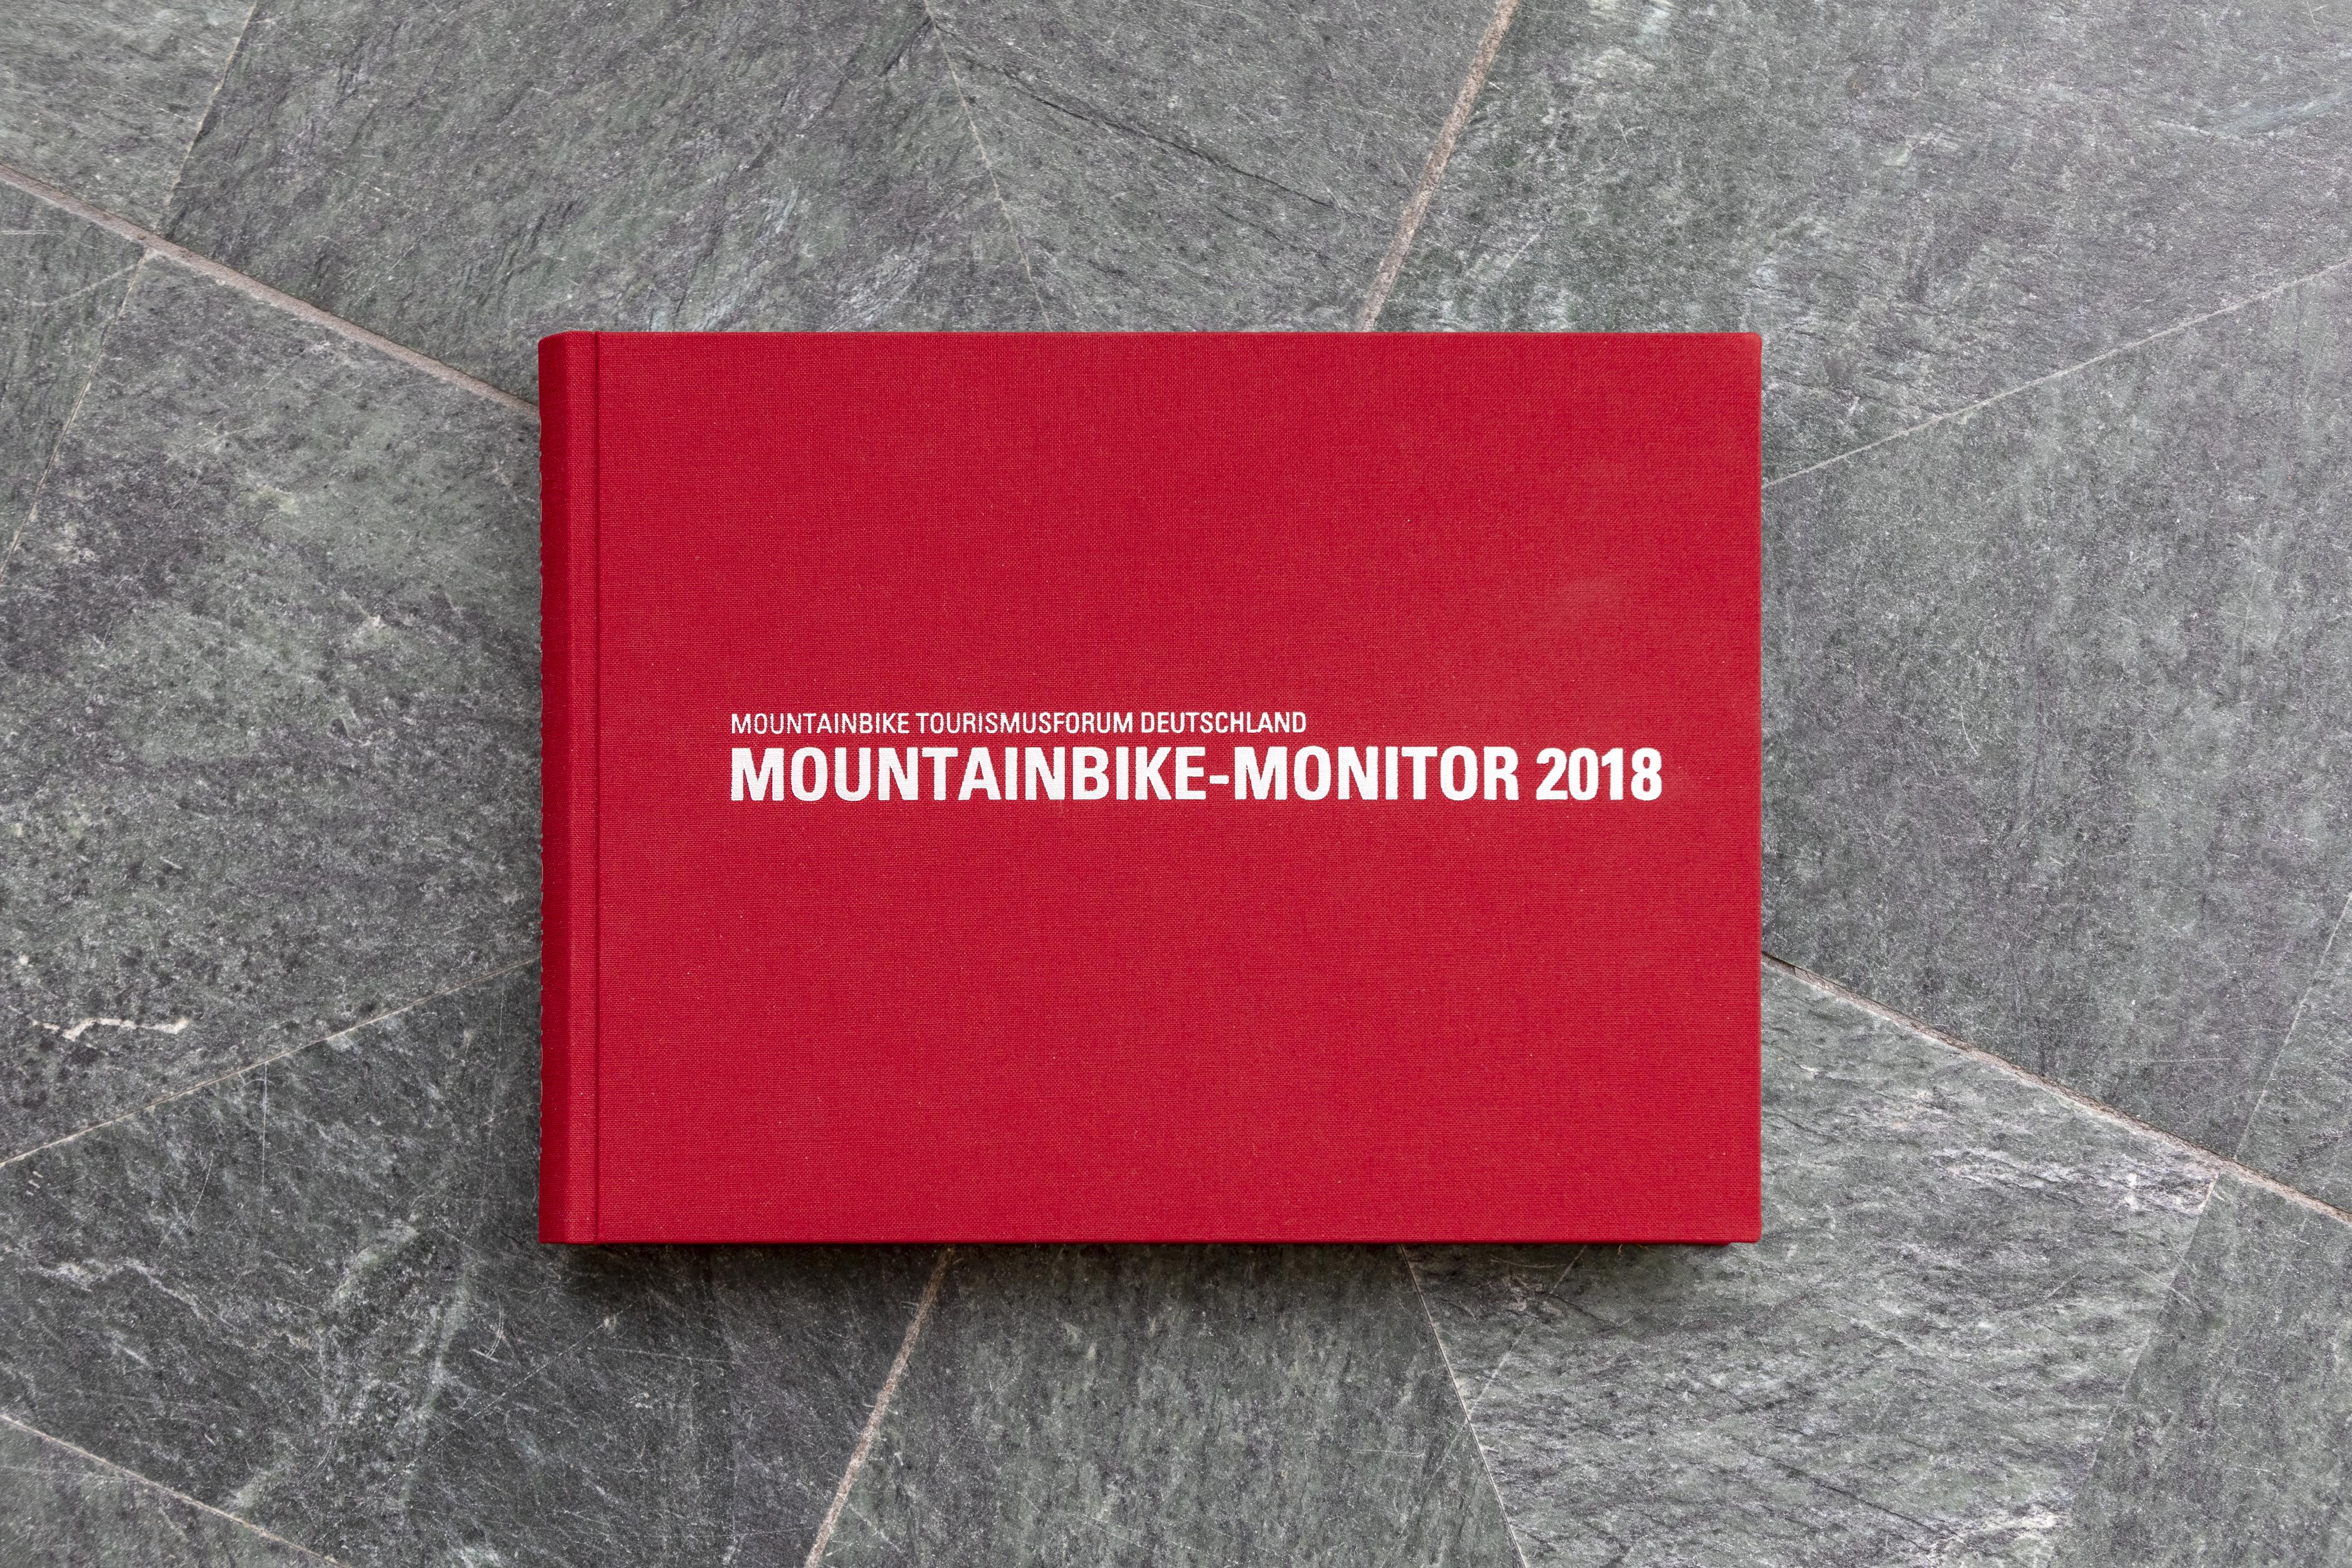 MTB-Kongress 2019 - 190509 - 368